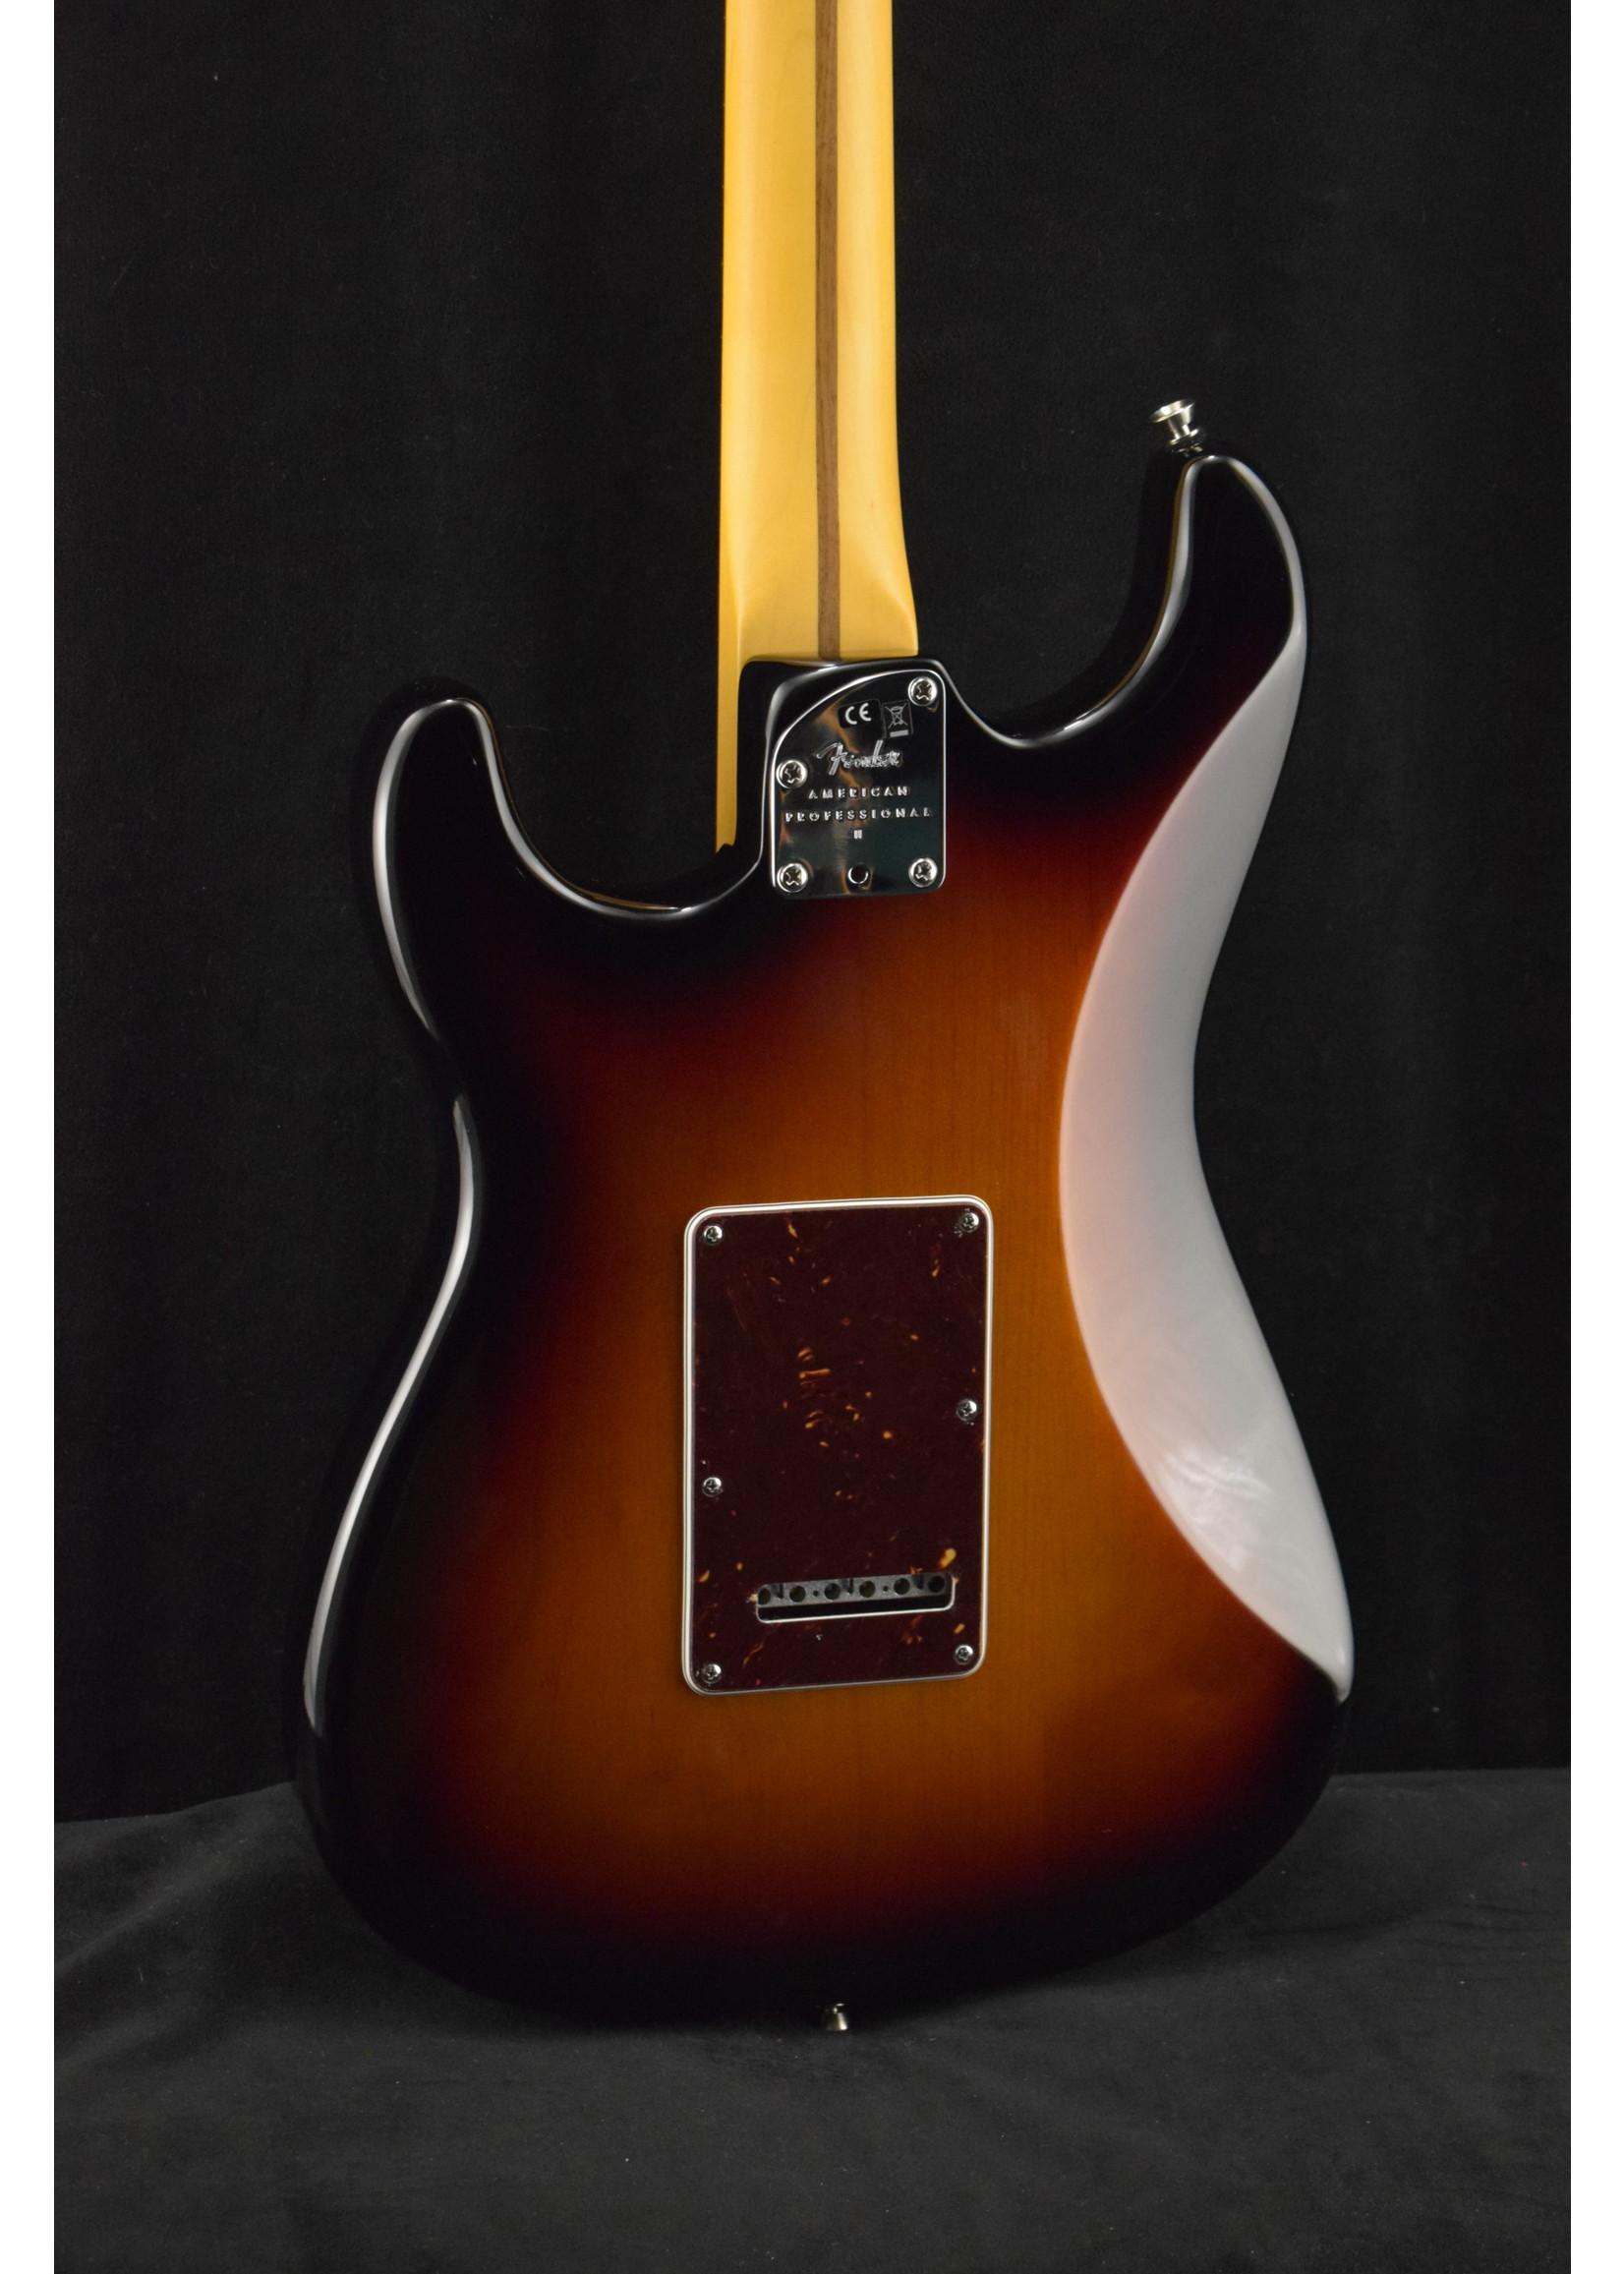 Fender Fender American Professional II Stratocaster RW Sunburst